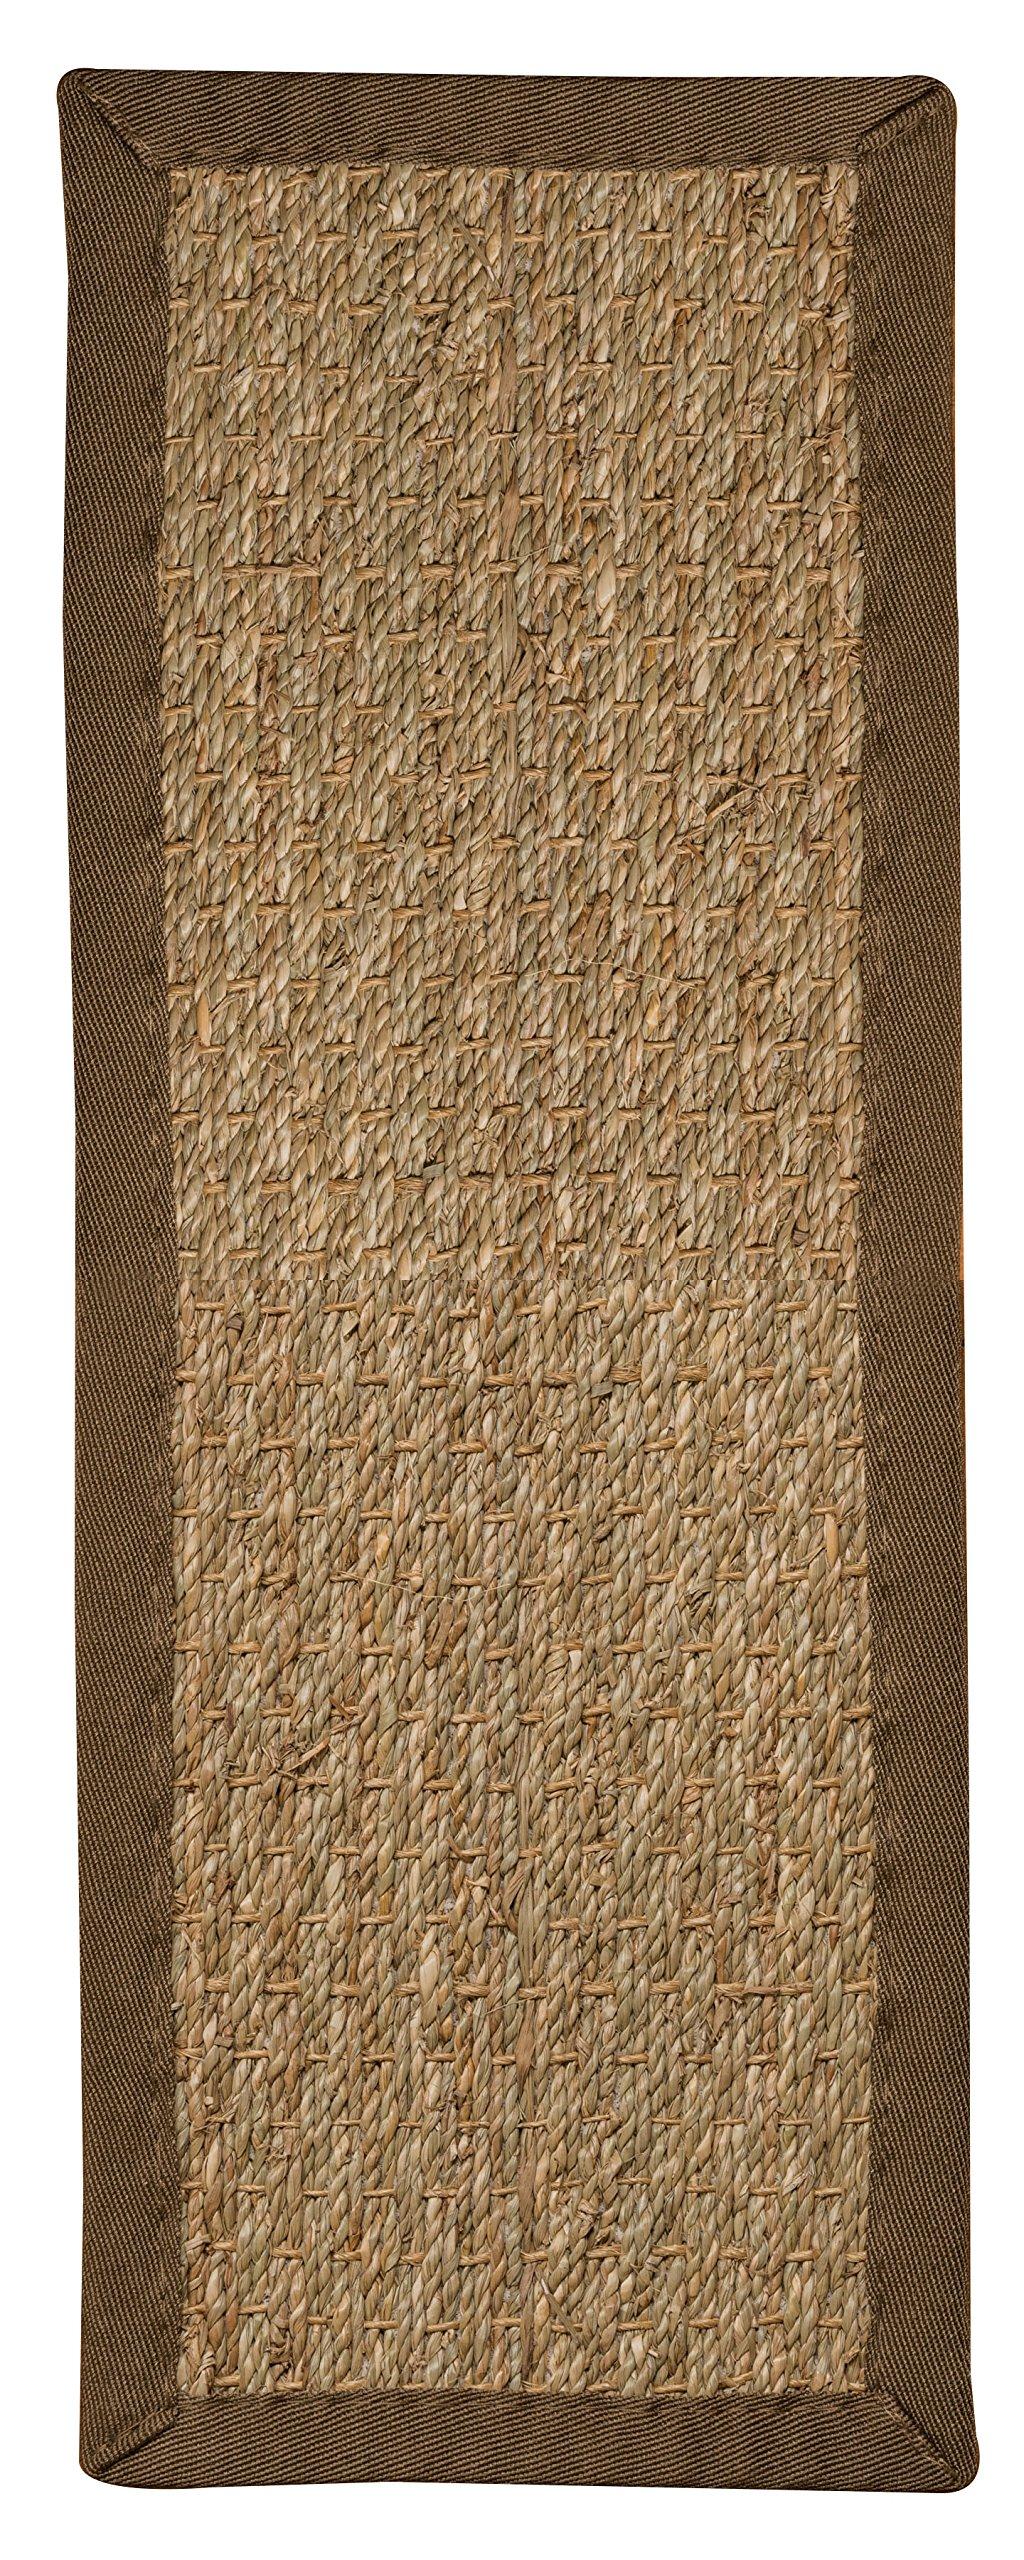 Natural Area Rugs 100% Natural Fiber Half Panama, Seagrass Sage, Handmade Stair Treads Carpet Set of 13 (9''x29'') Malt Border